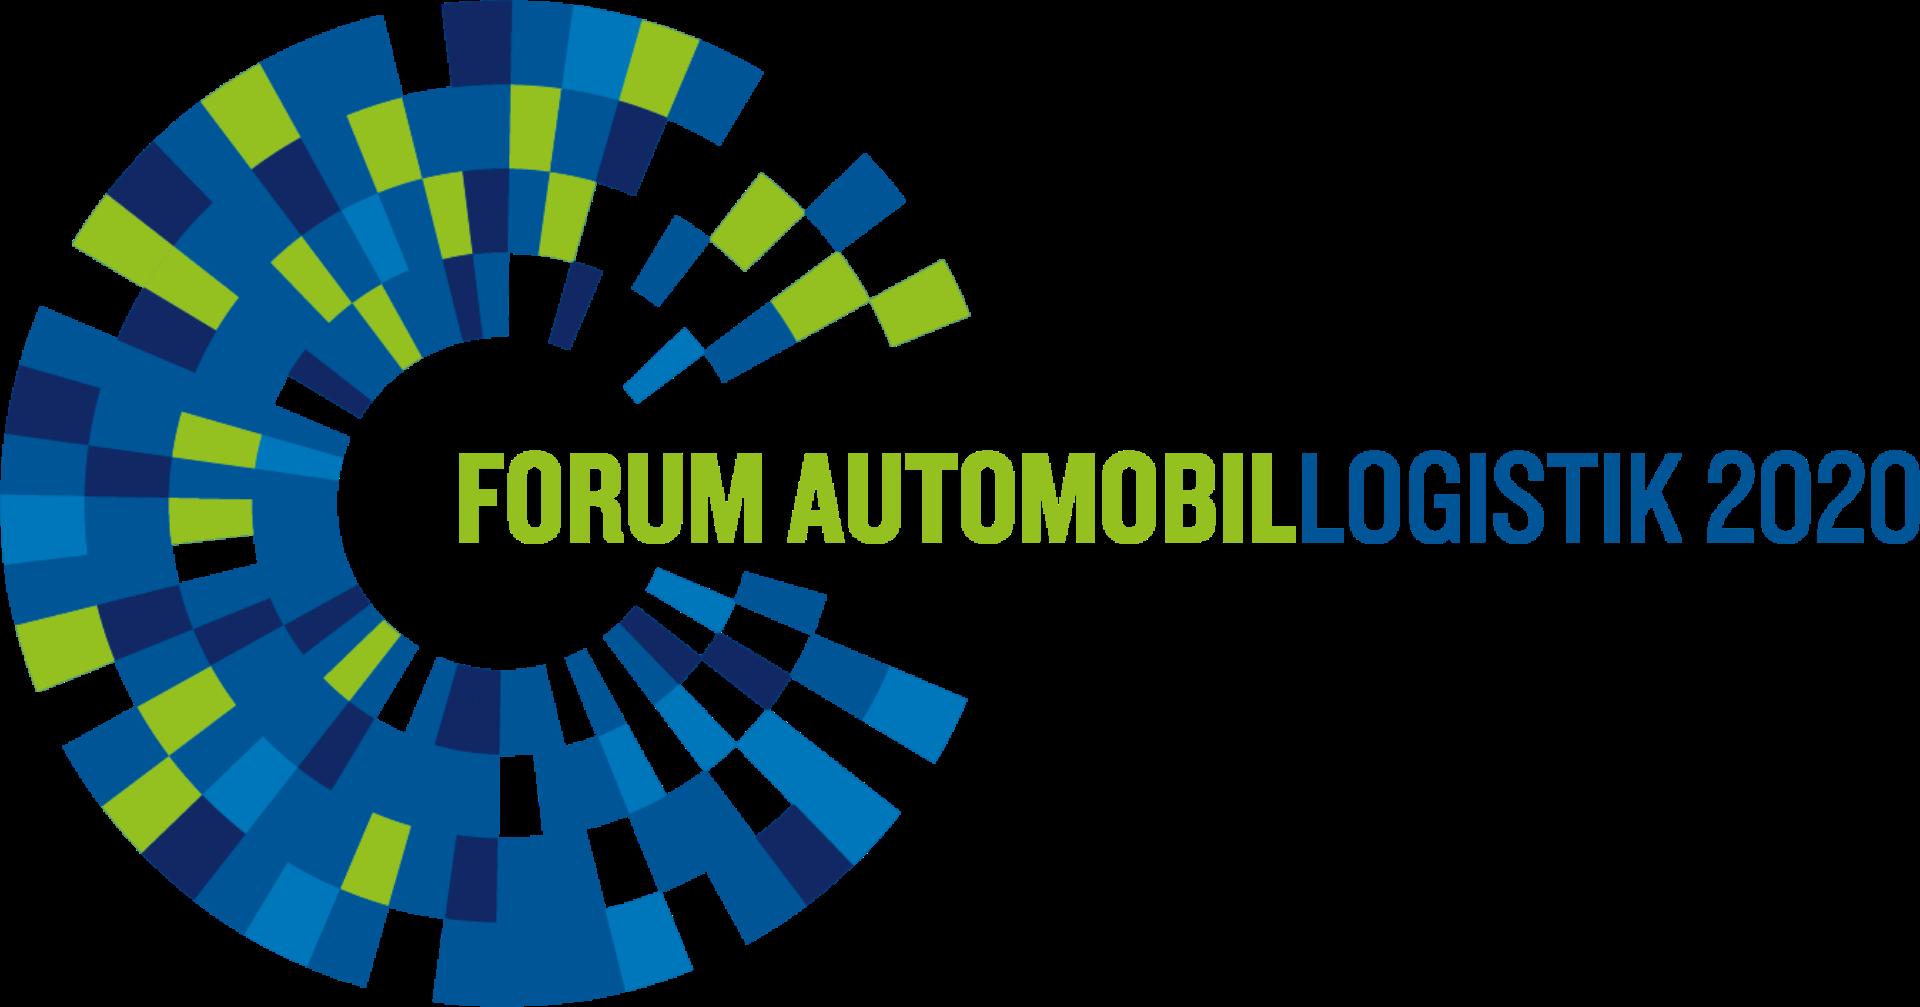 BVL Forum Automobillogistik